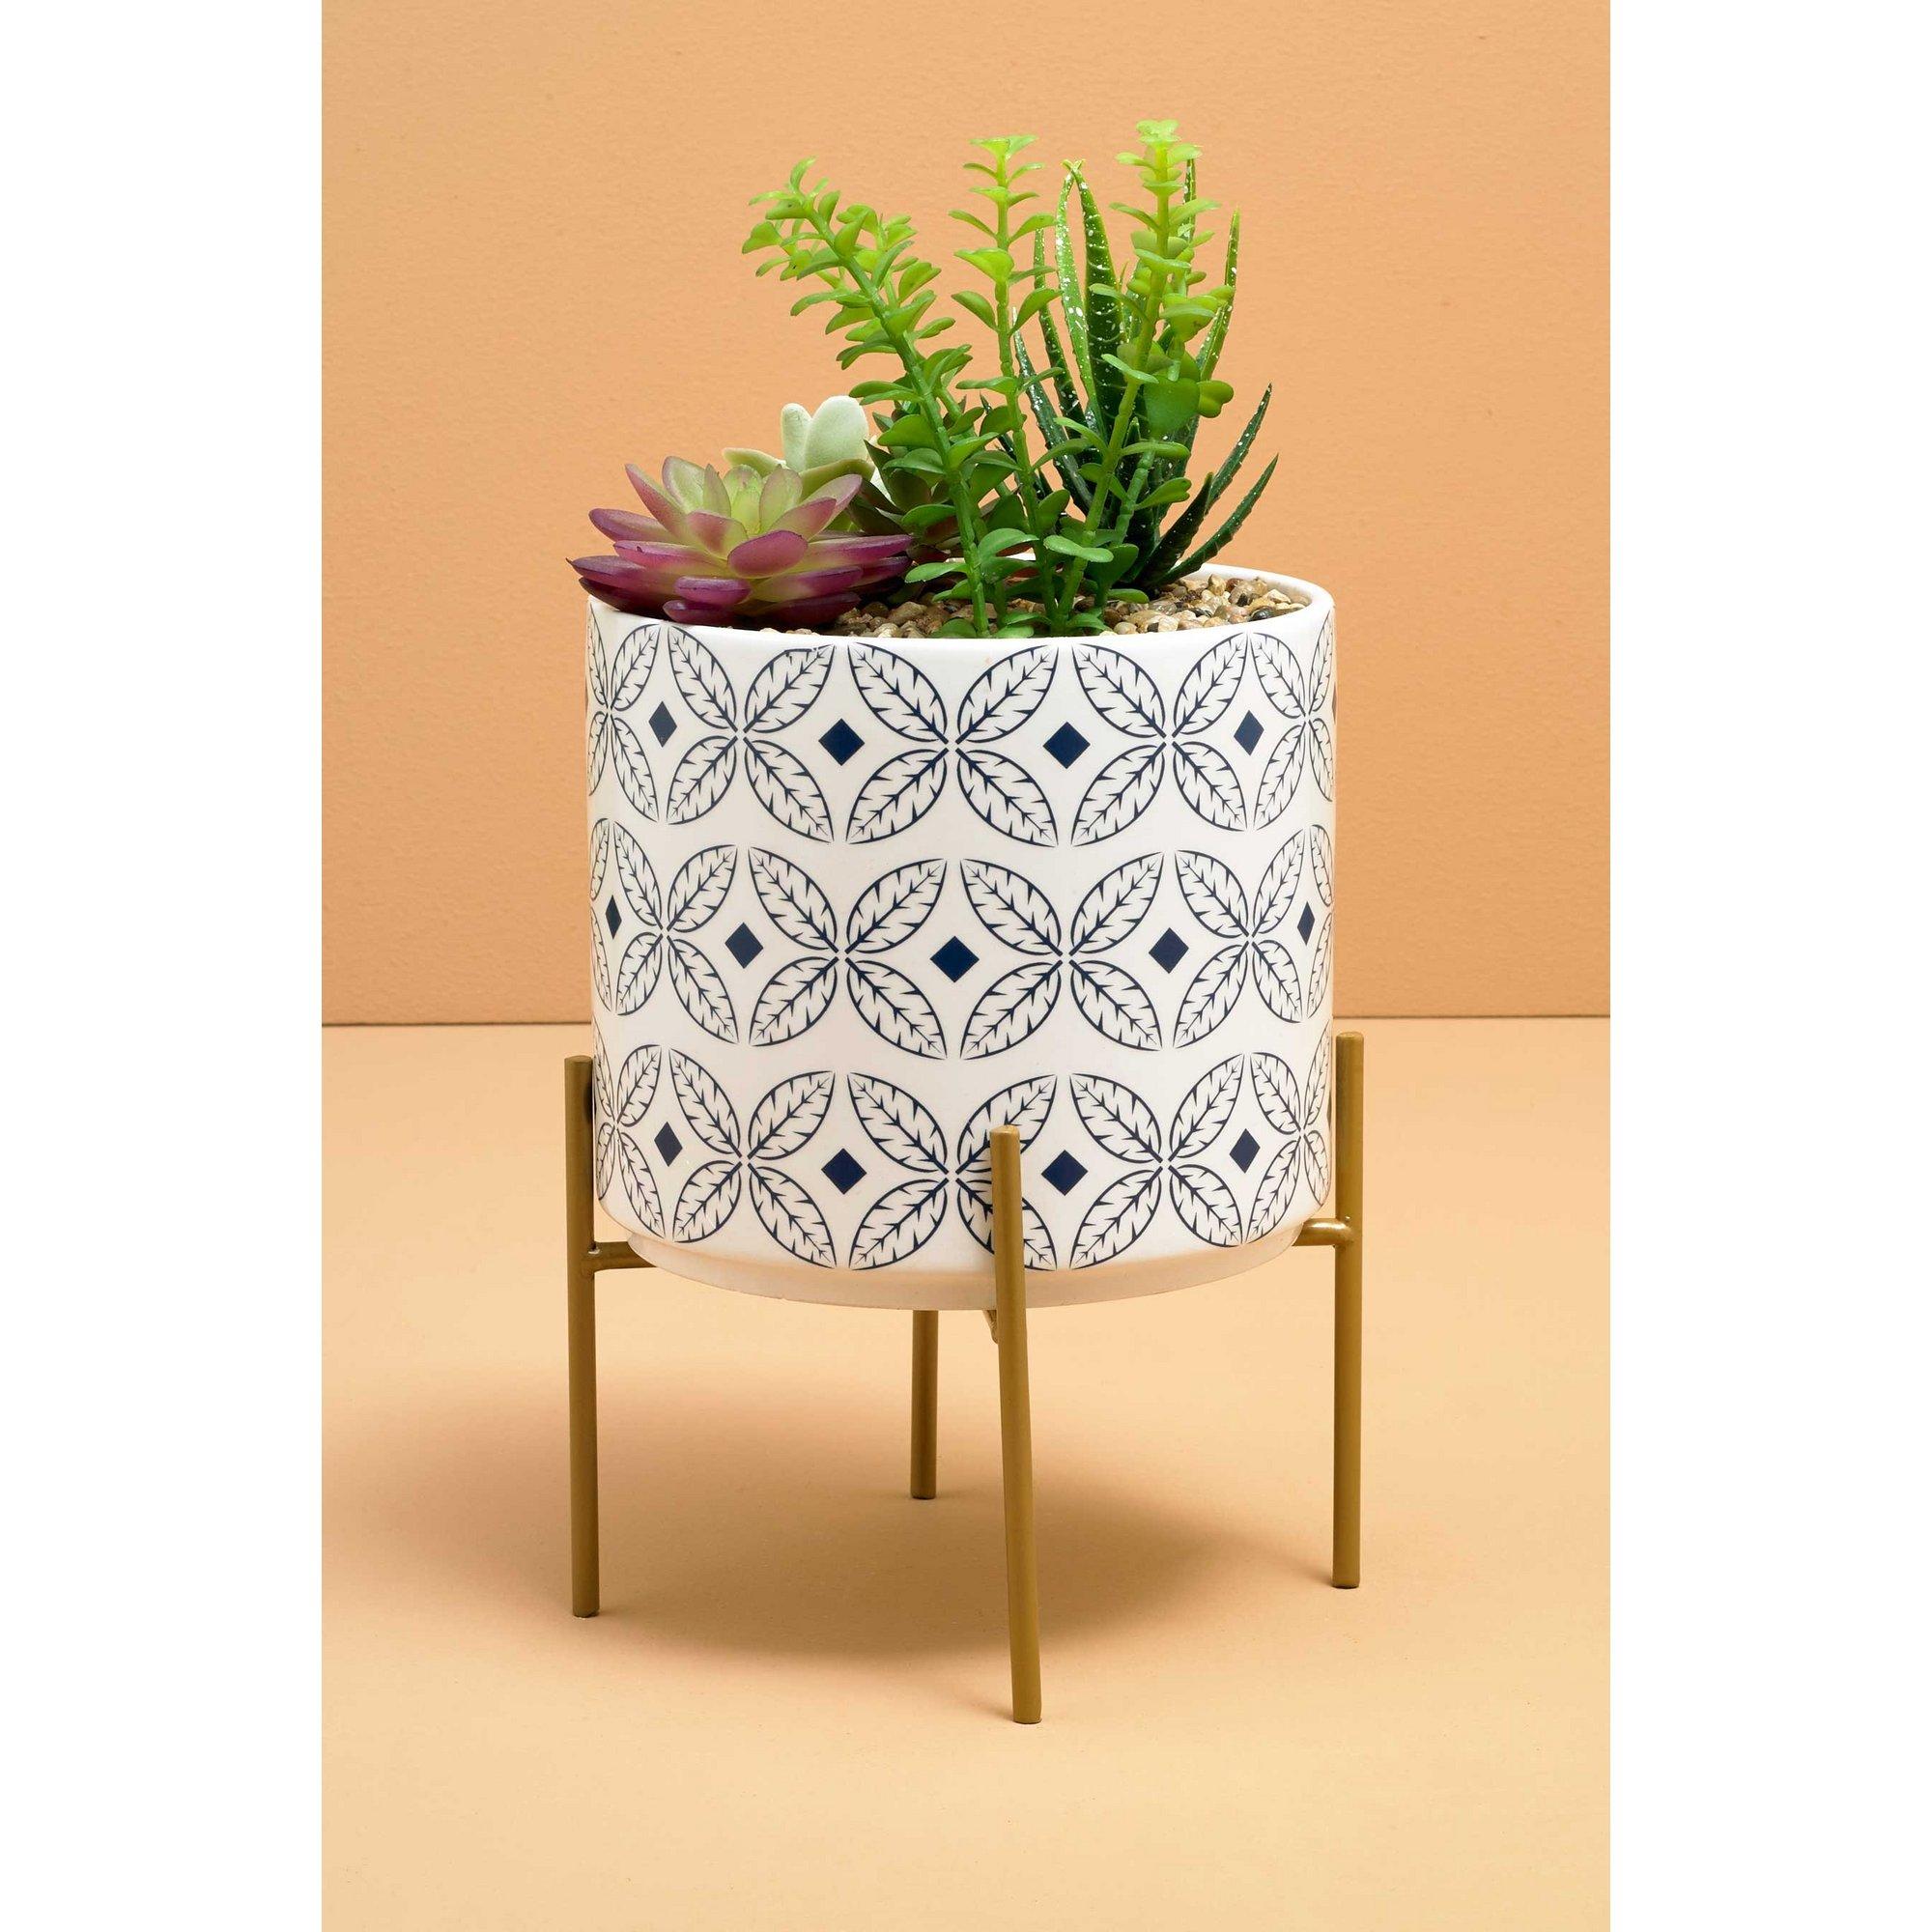 Image of Blue Diamond Ceramic Planter with Stand